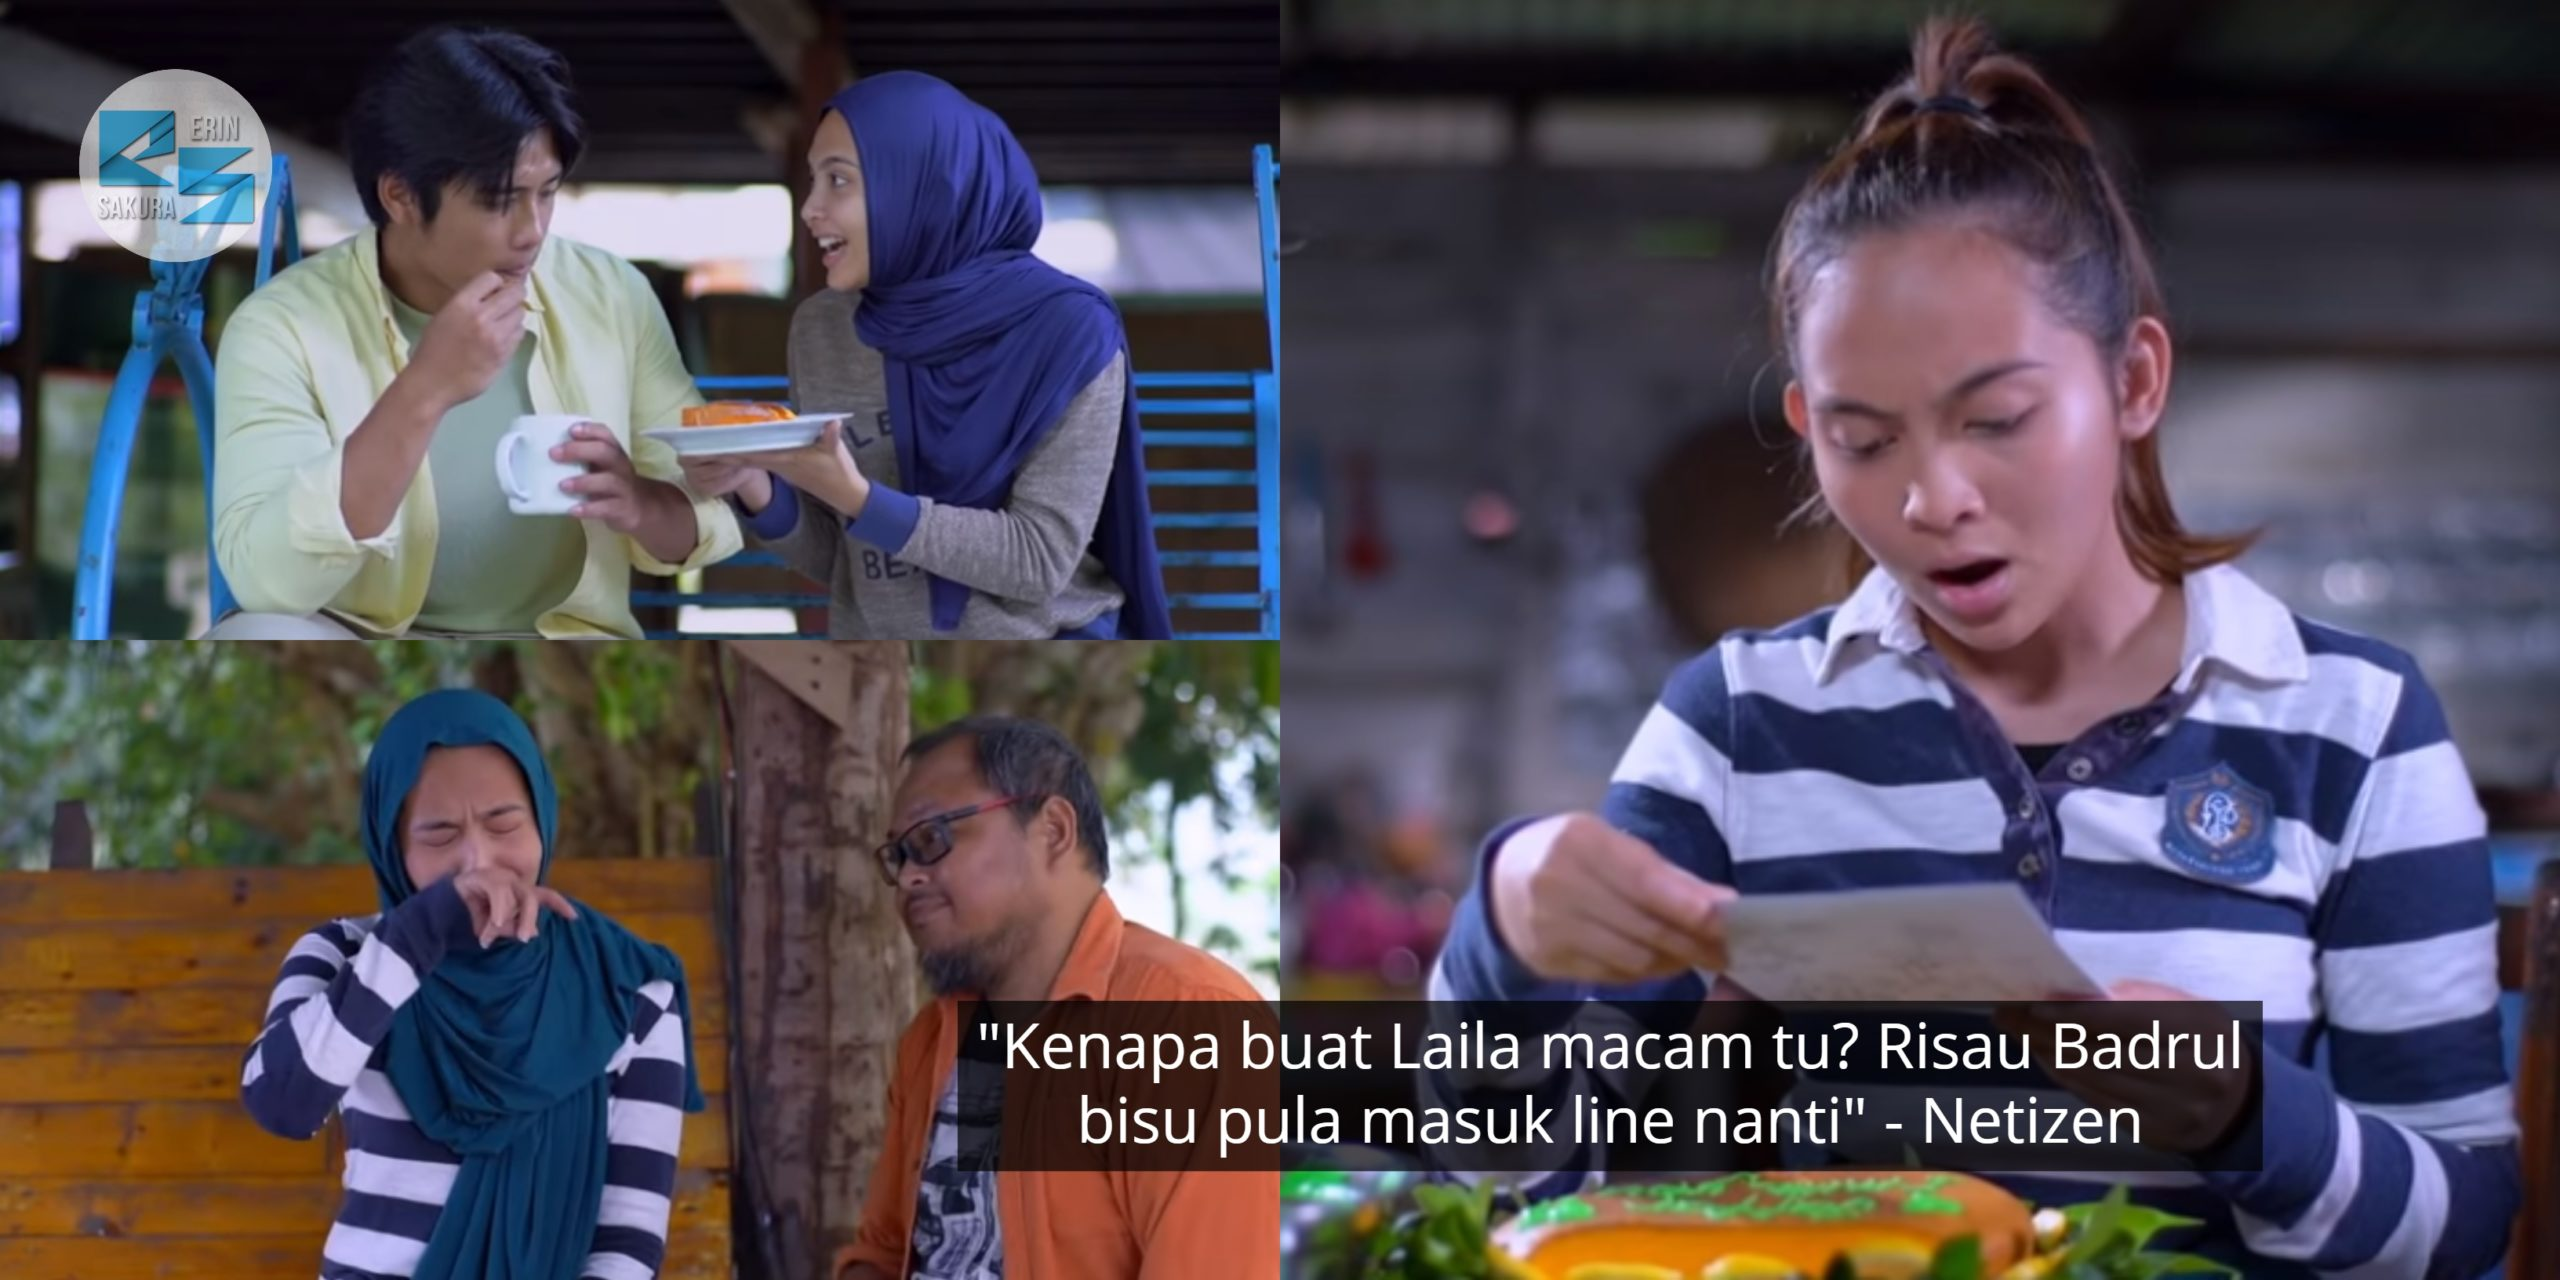 [VIDEO] Belum Sempat Confess, Laila Kecewa 'Jekfer' Bertunang Dengan Gadis Lain